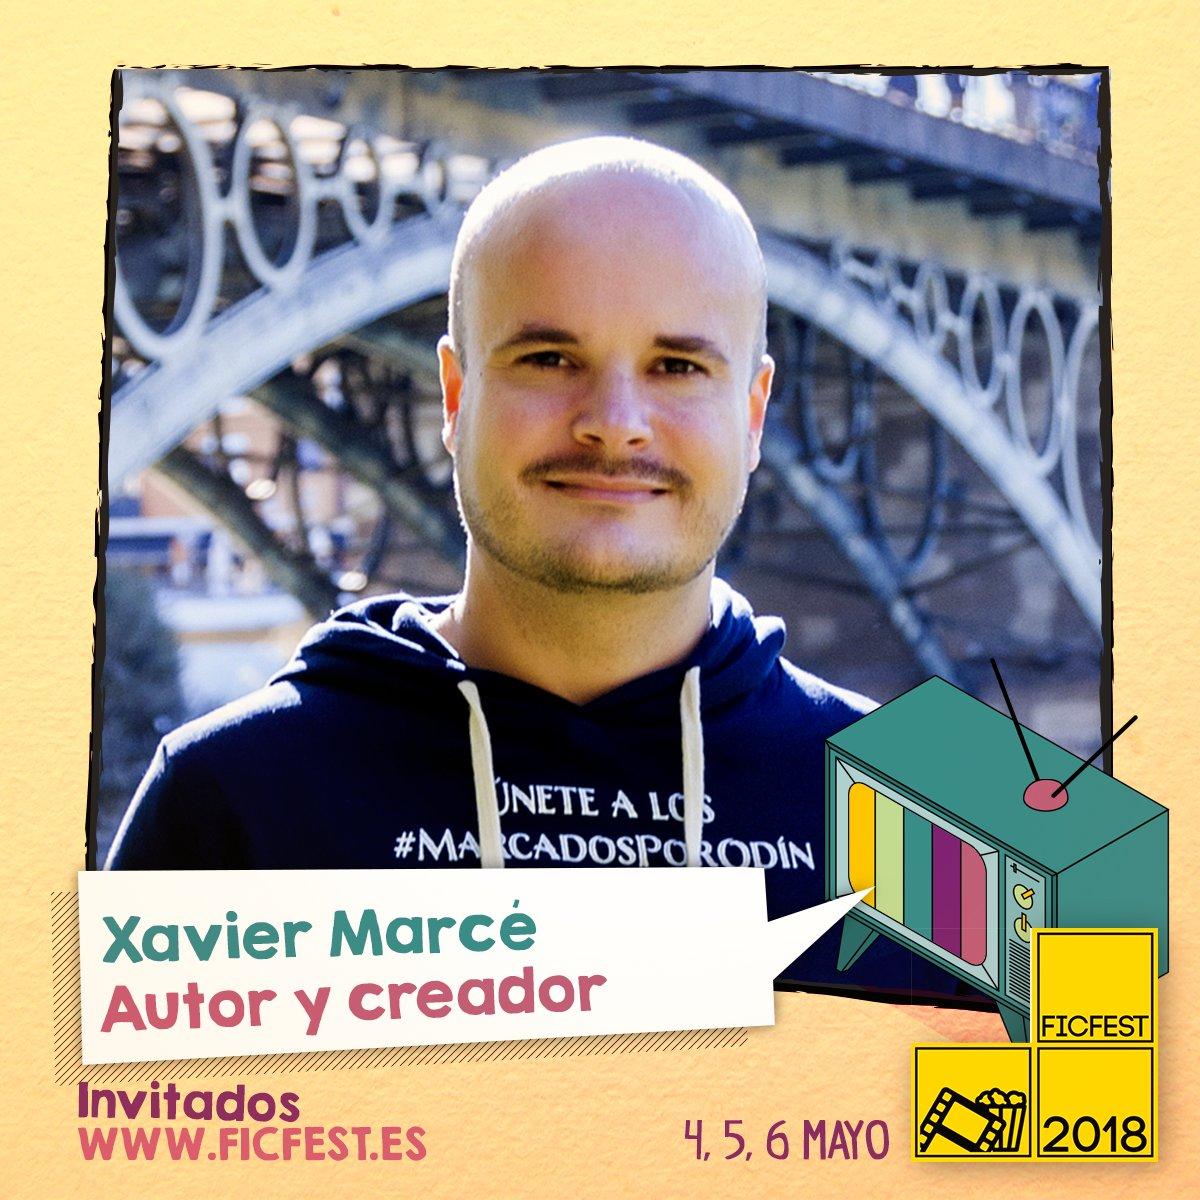 fotoxmvficfest2018.jpg